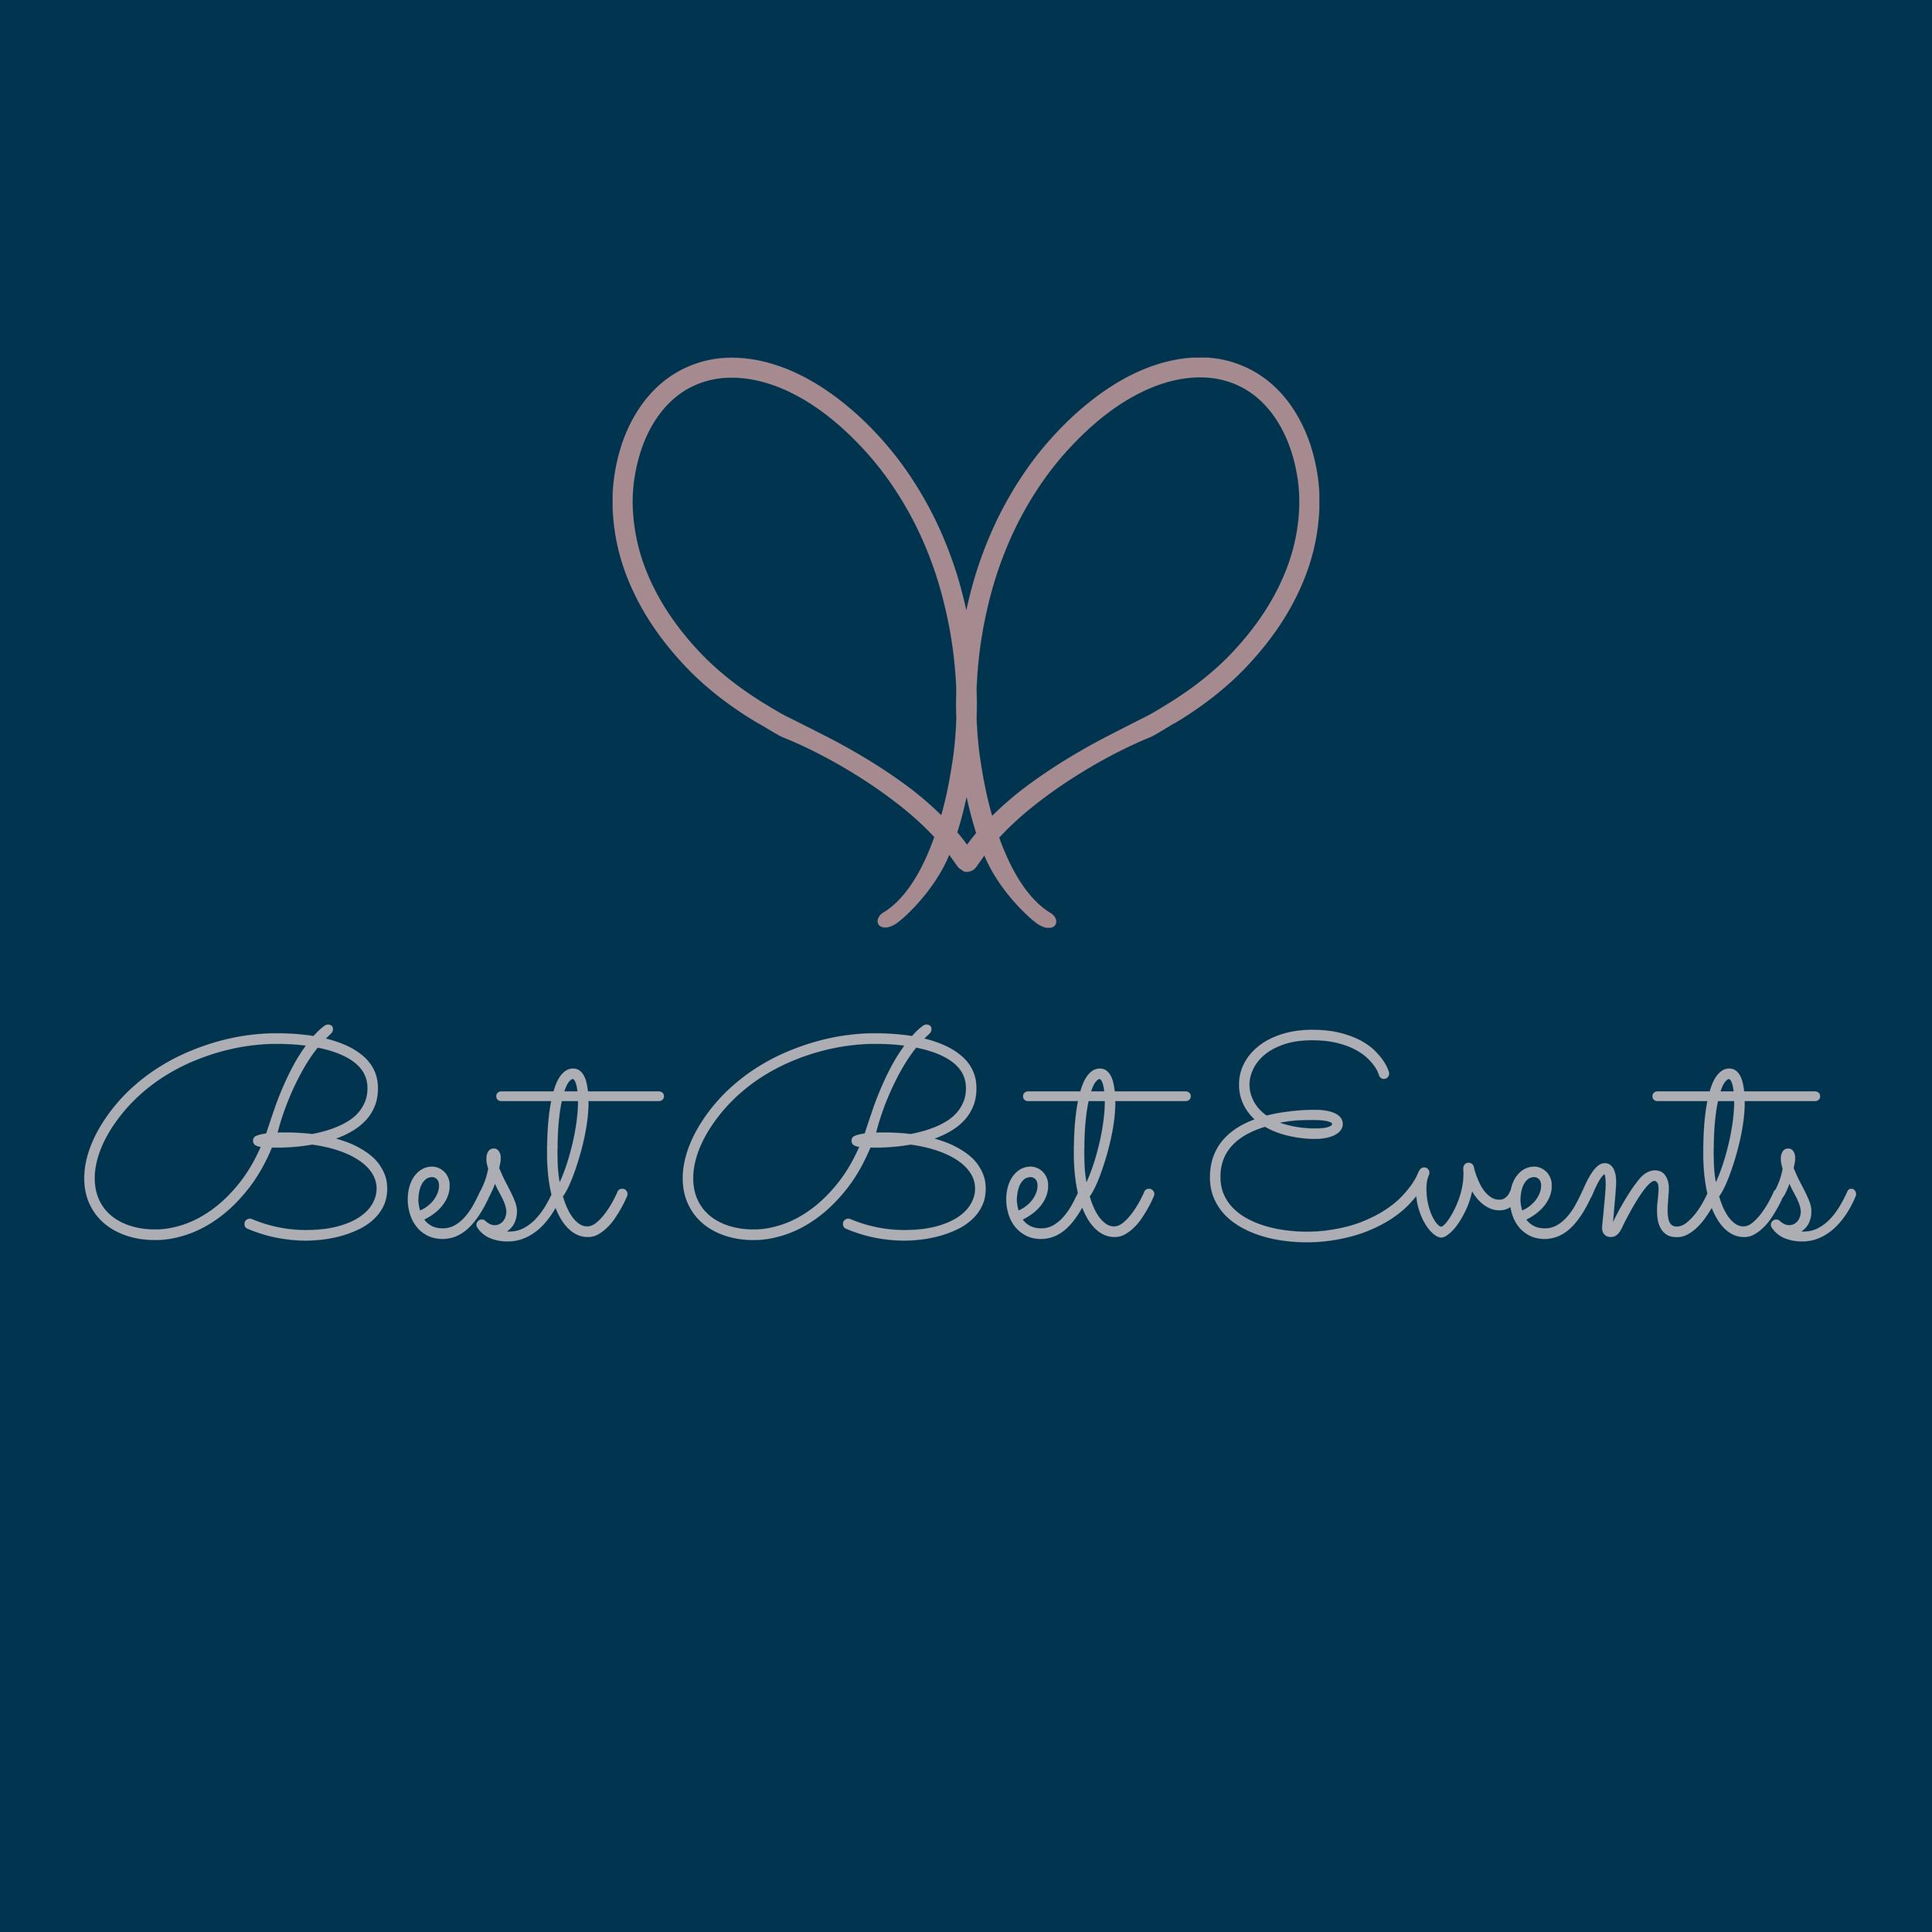 Event Planner branding logo graphic design by Hagan Design Co Champaign Illinois